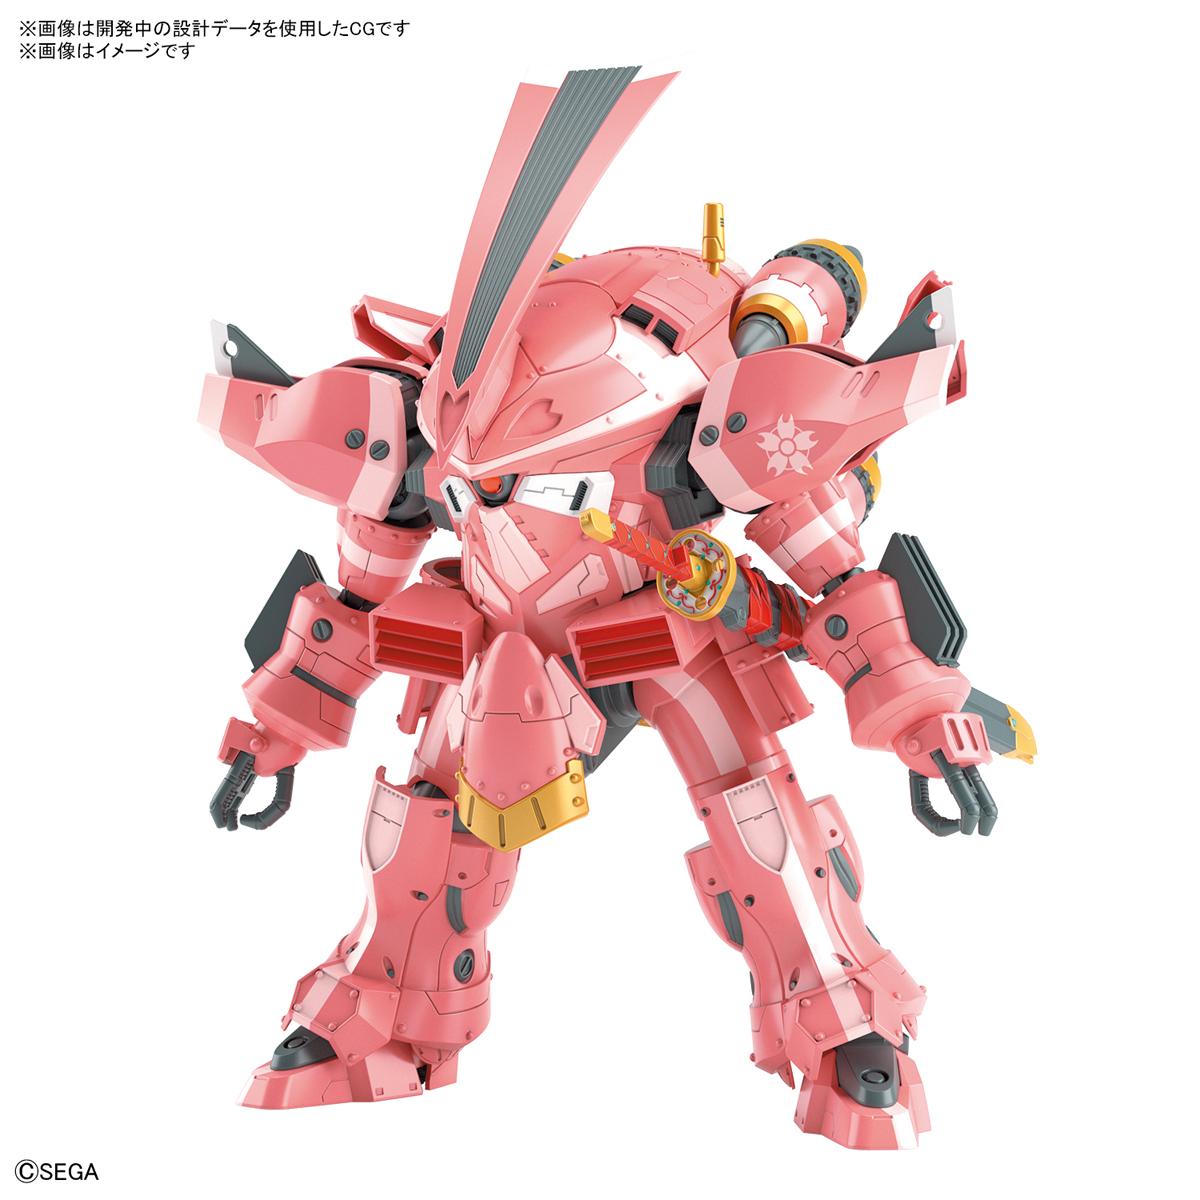 HG 1/24『霊子戦闘機・試製桜武(天宮さくら機)』新サクラ大戦 プラモデル-001